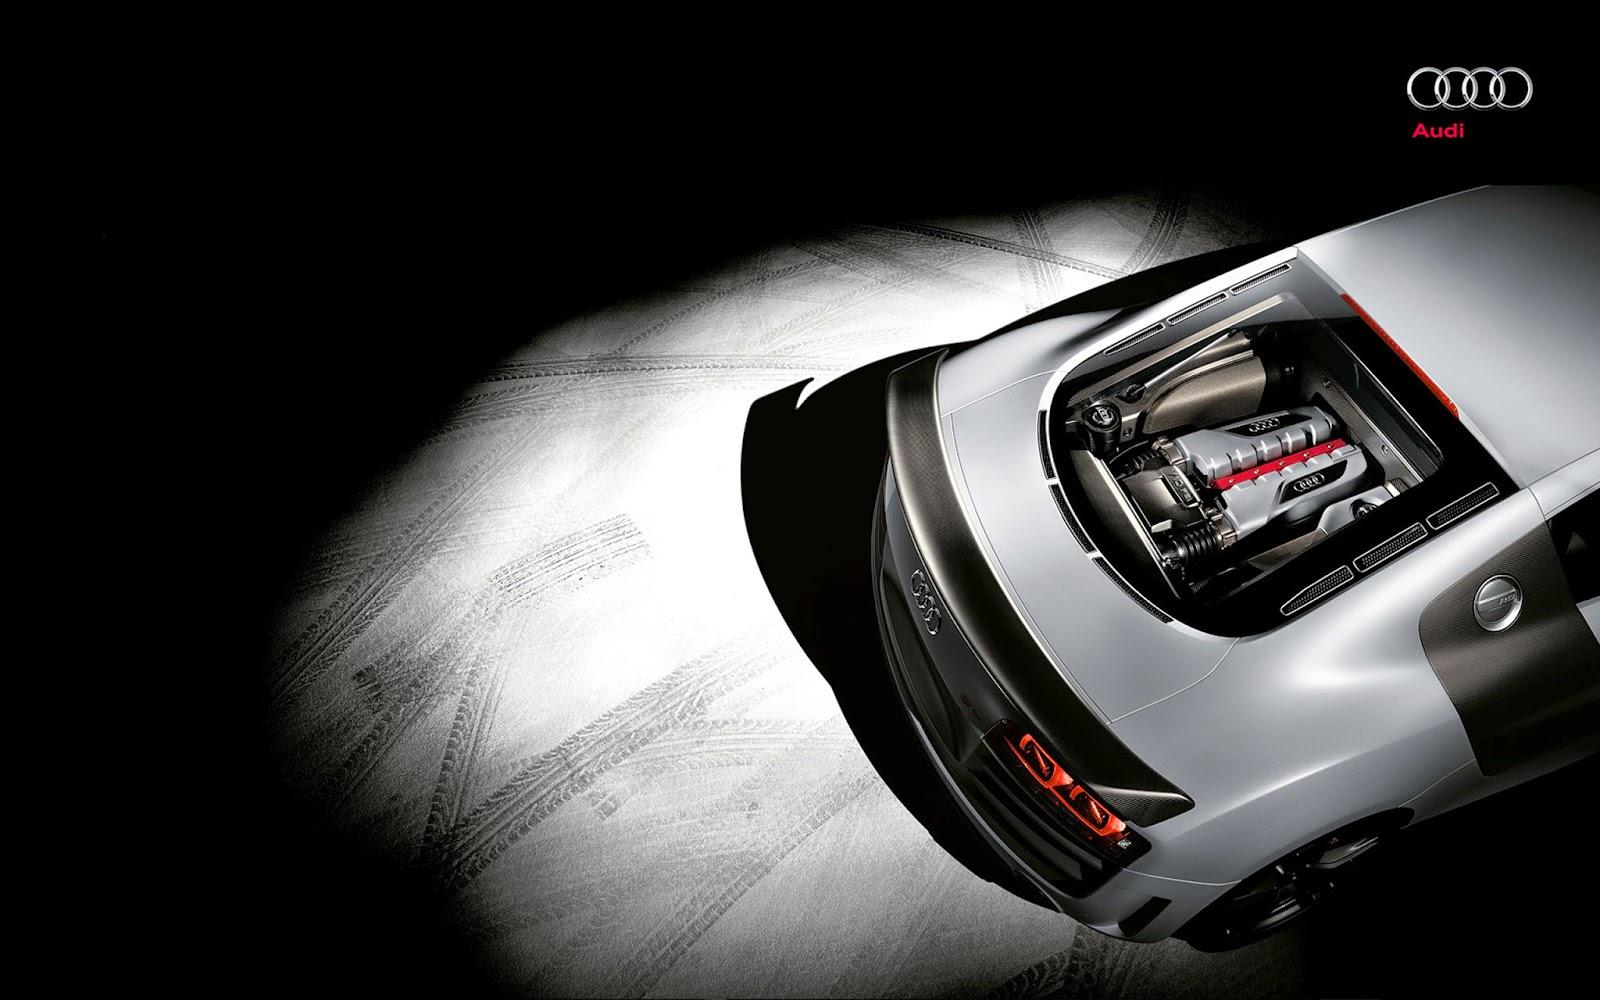 http://www.autocarsinfo.com/2014/10/audi-r8-rear-engine-best-wallpaper.html